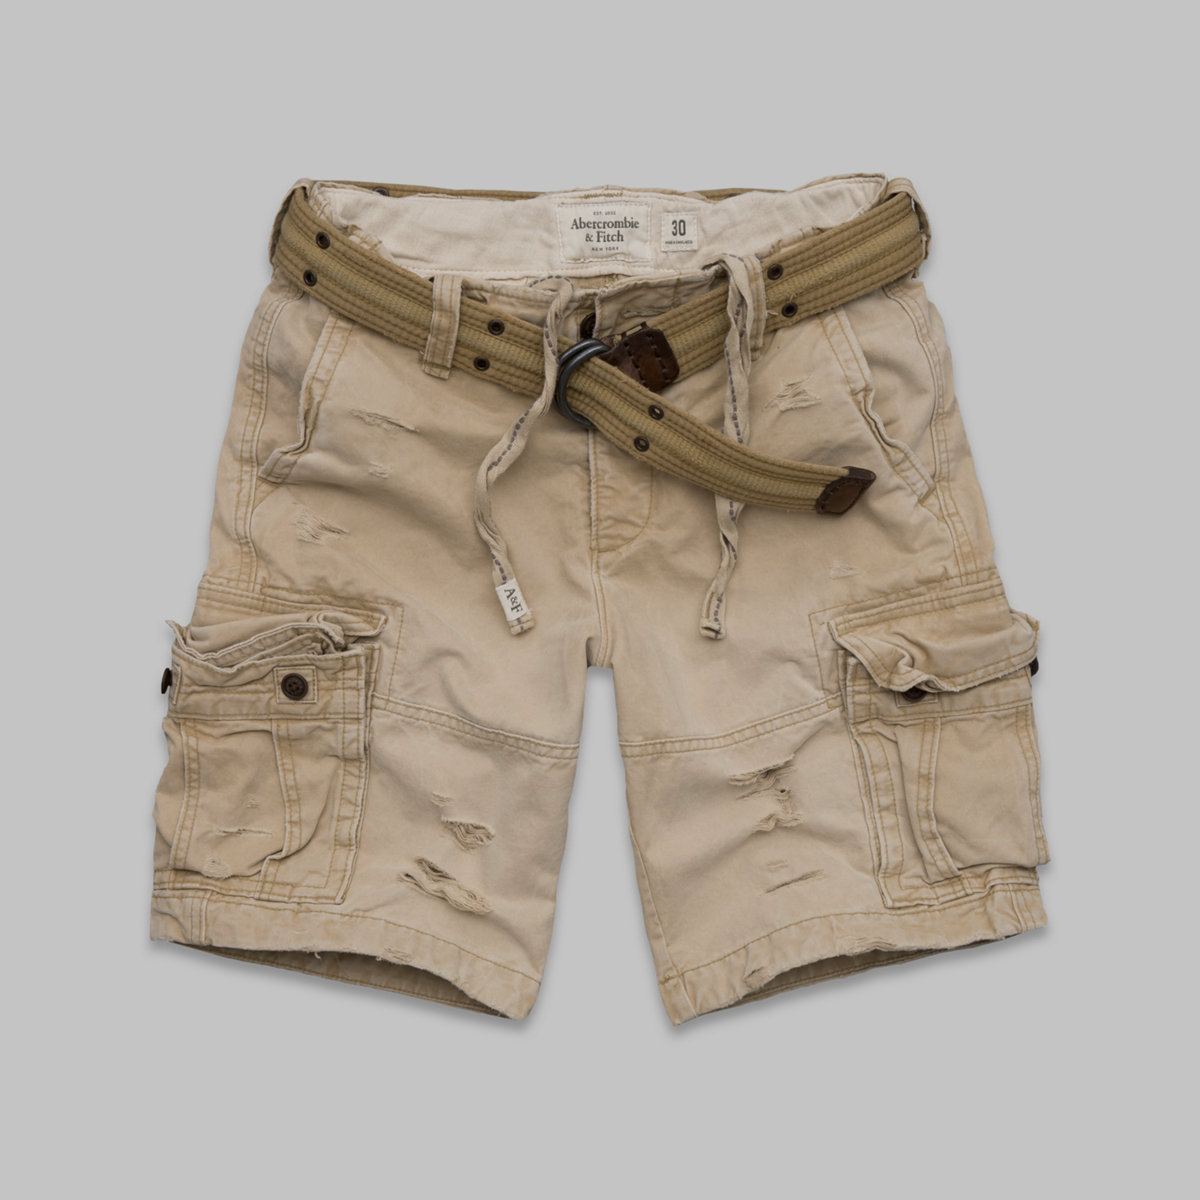 A&F Cargo Shorts